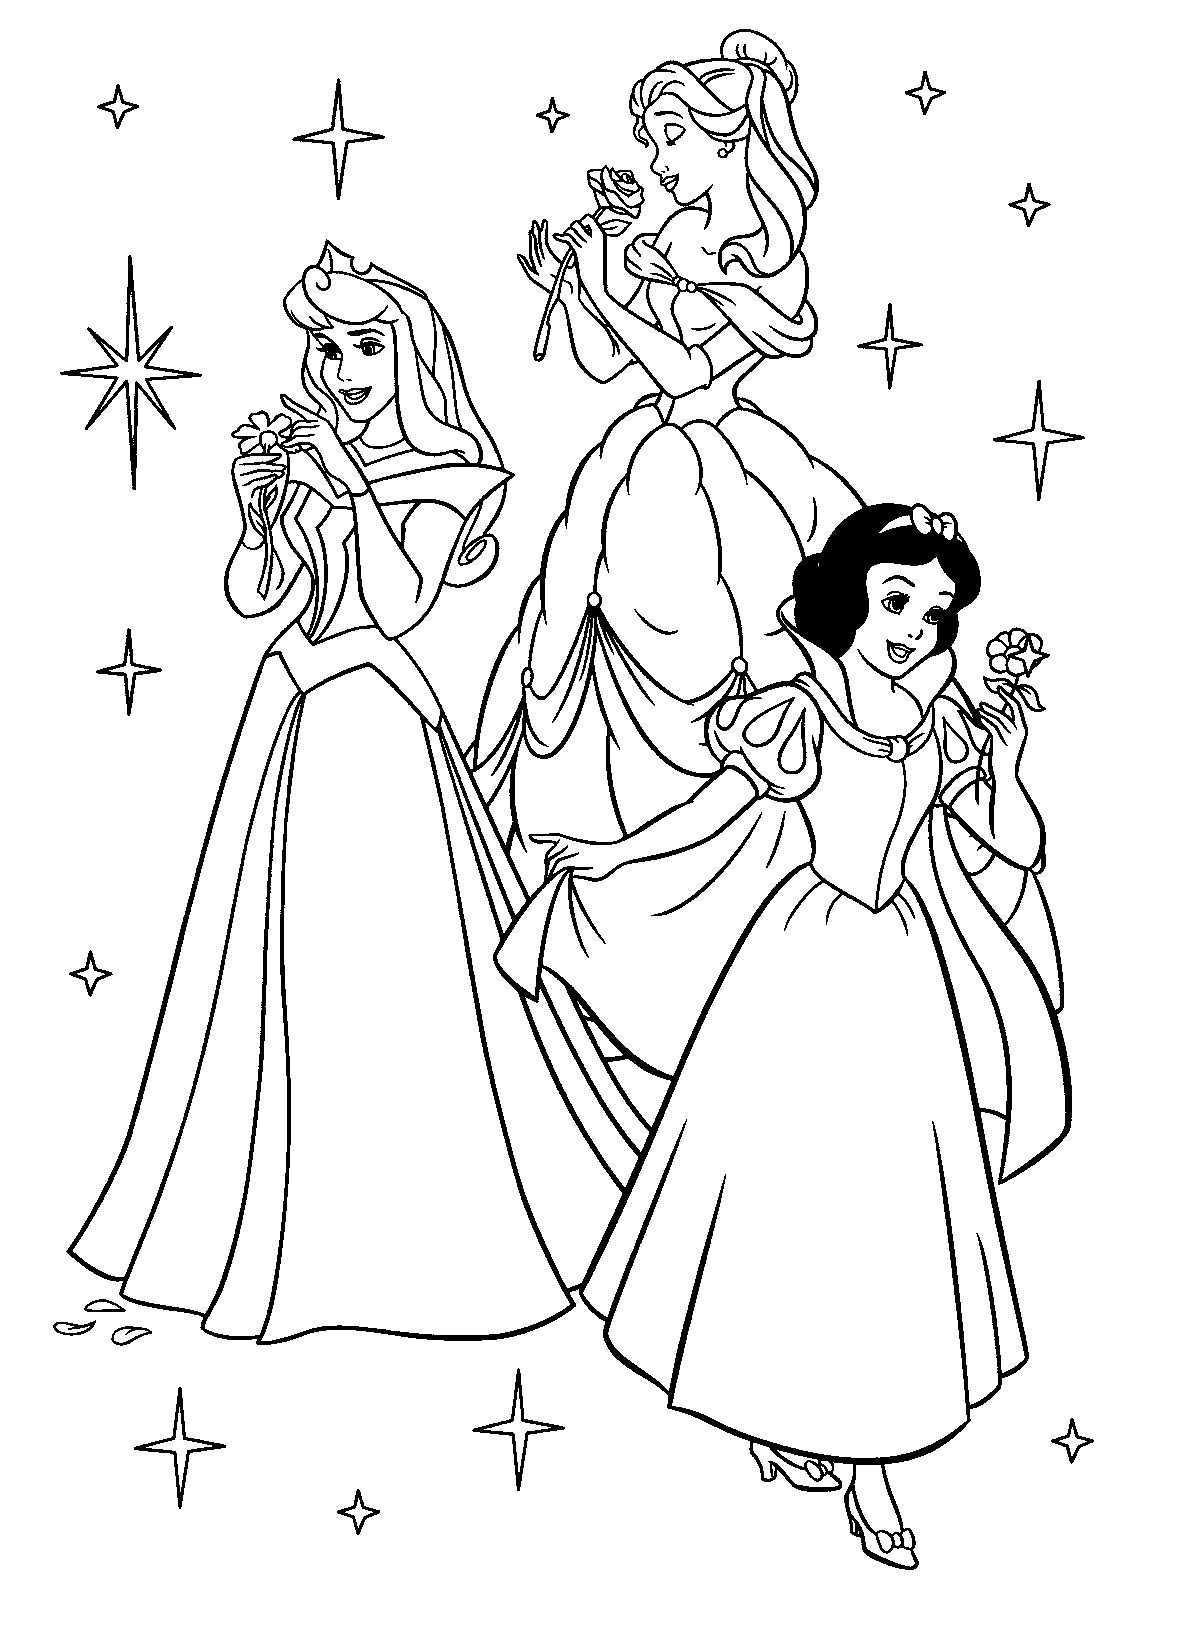 Disney Prinsessen Kleurplaten Disney Kleurplaten Prinsessen